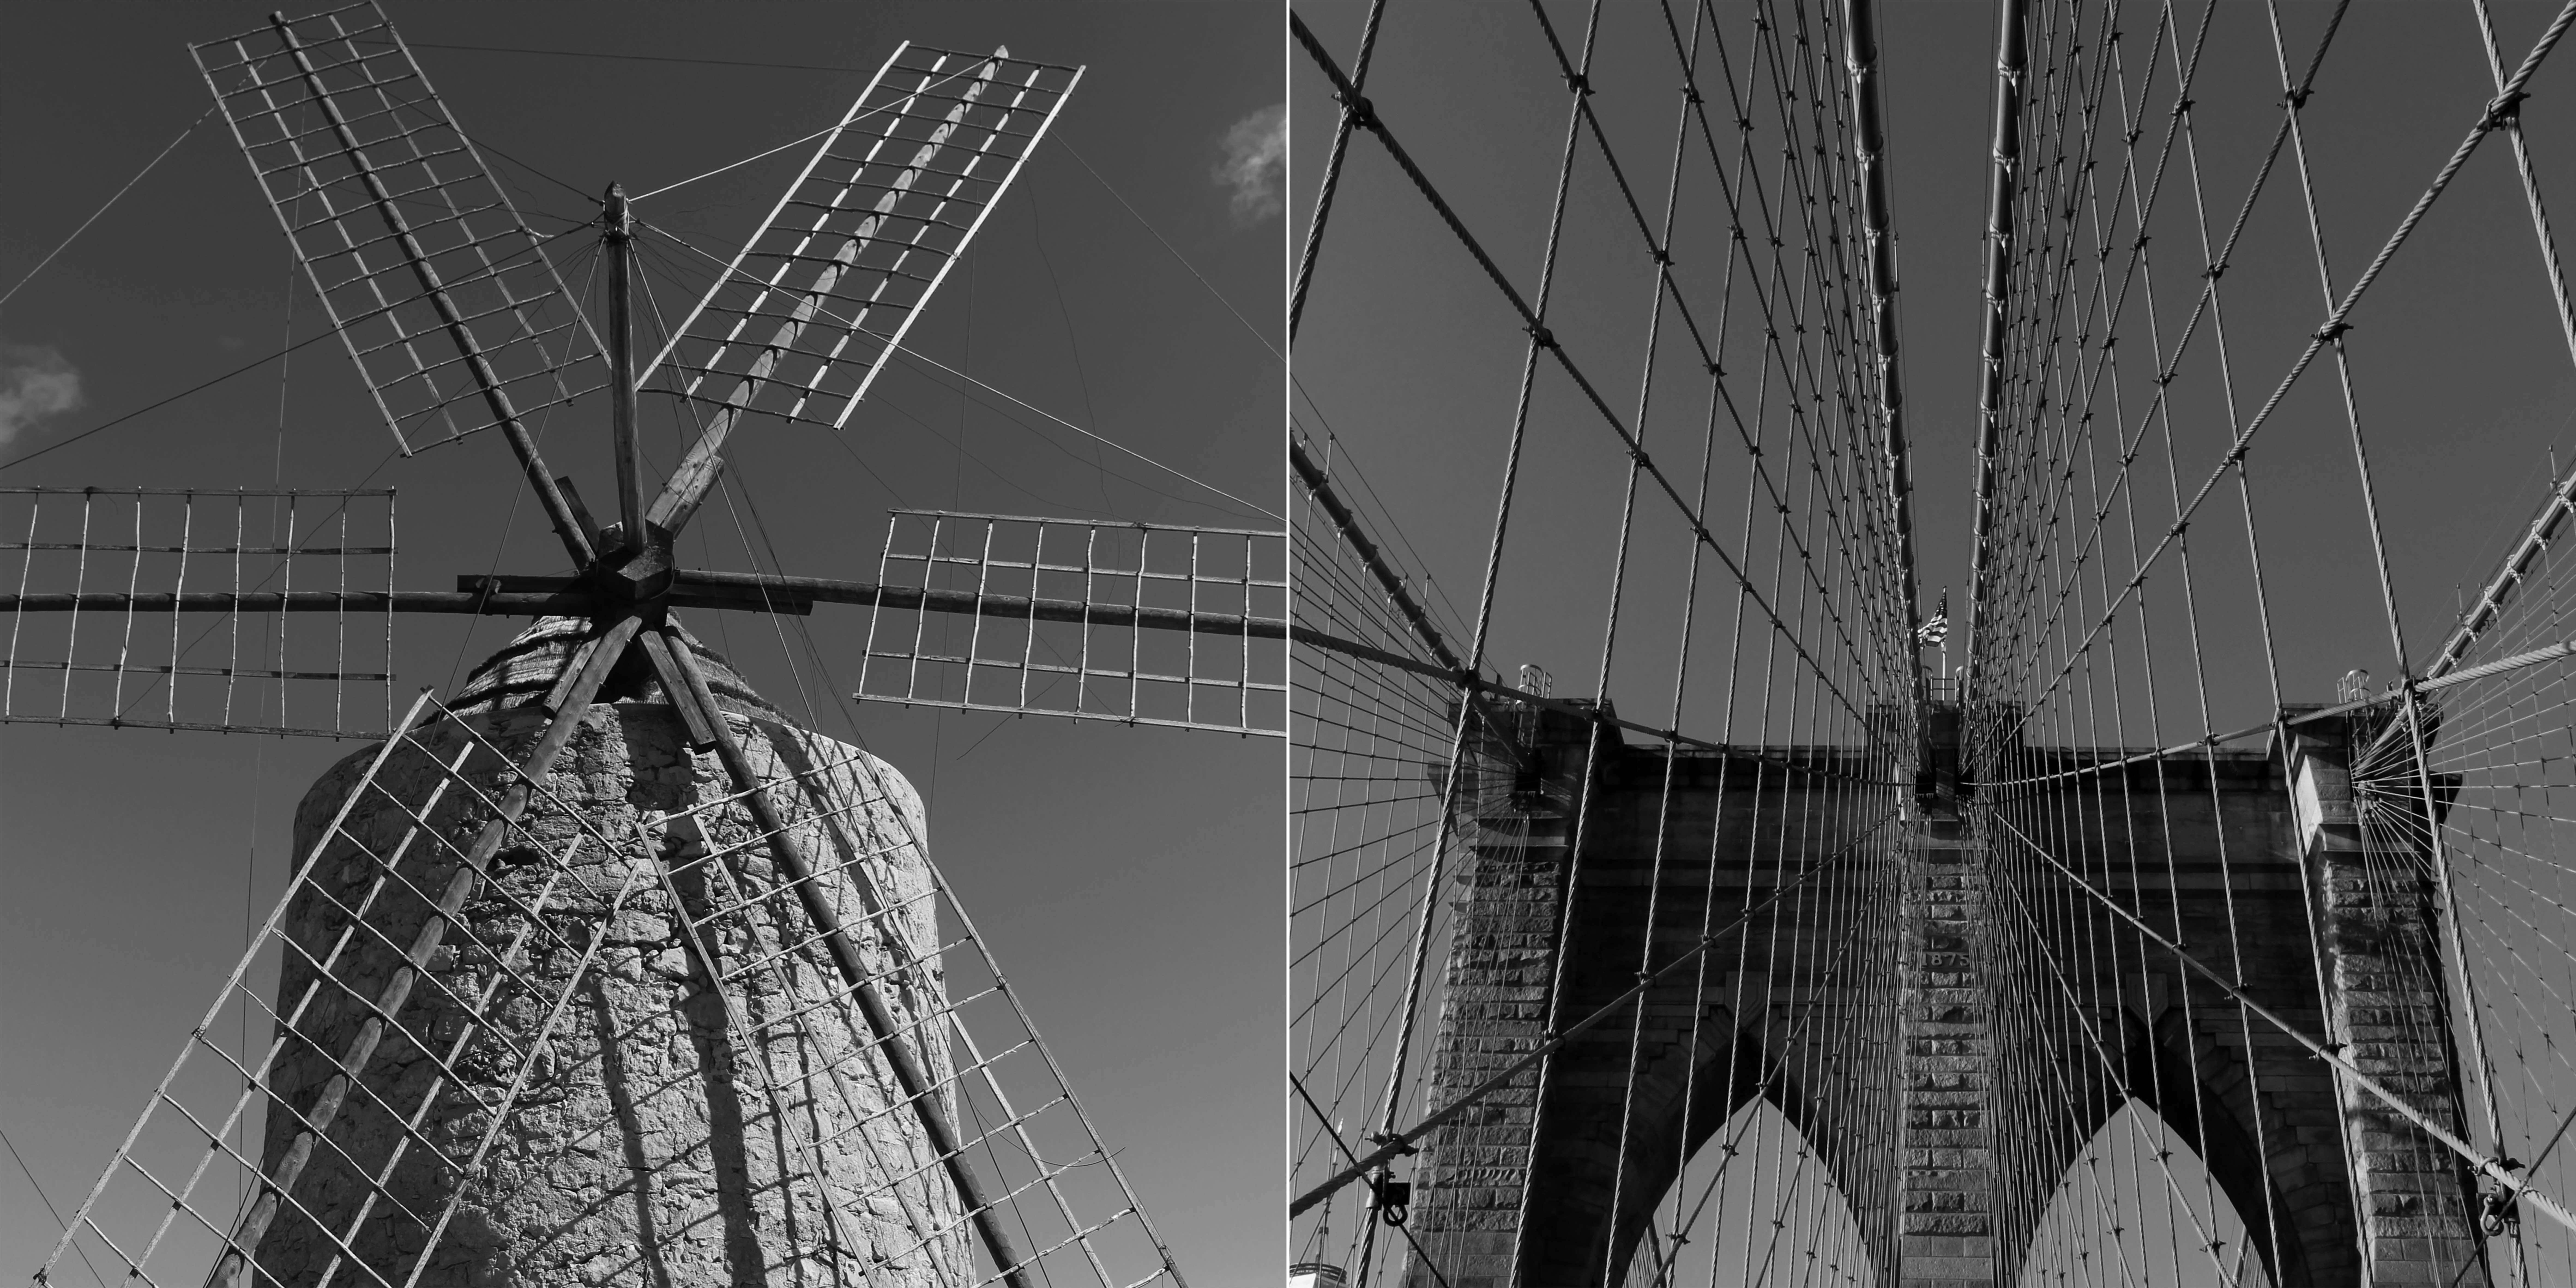 Brooklino Artwork, comparing a Formentera windmill and New York Brooklyn Bridge in Manhattan as part of the Formenhattan exhibition